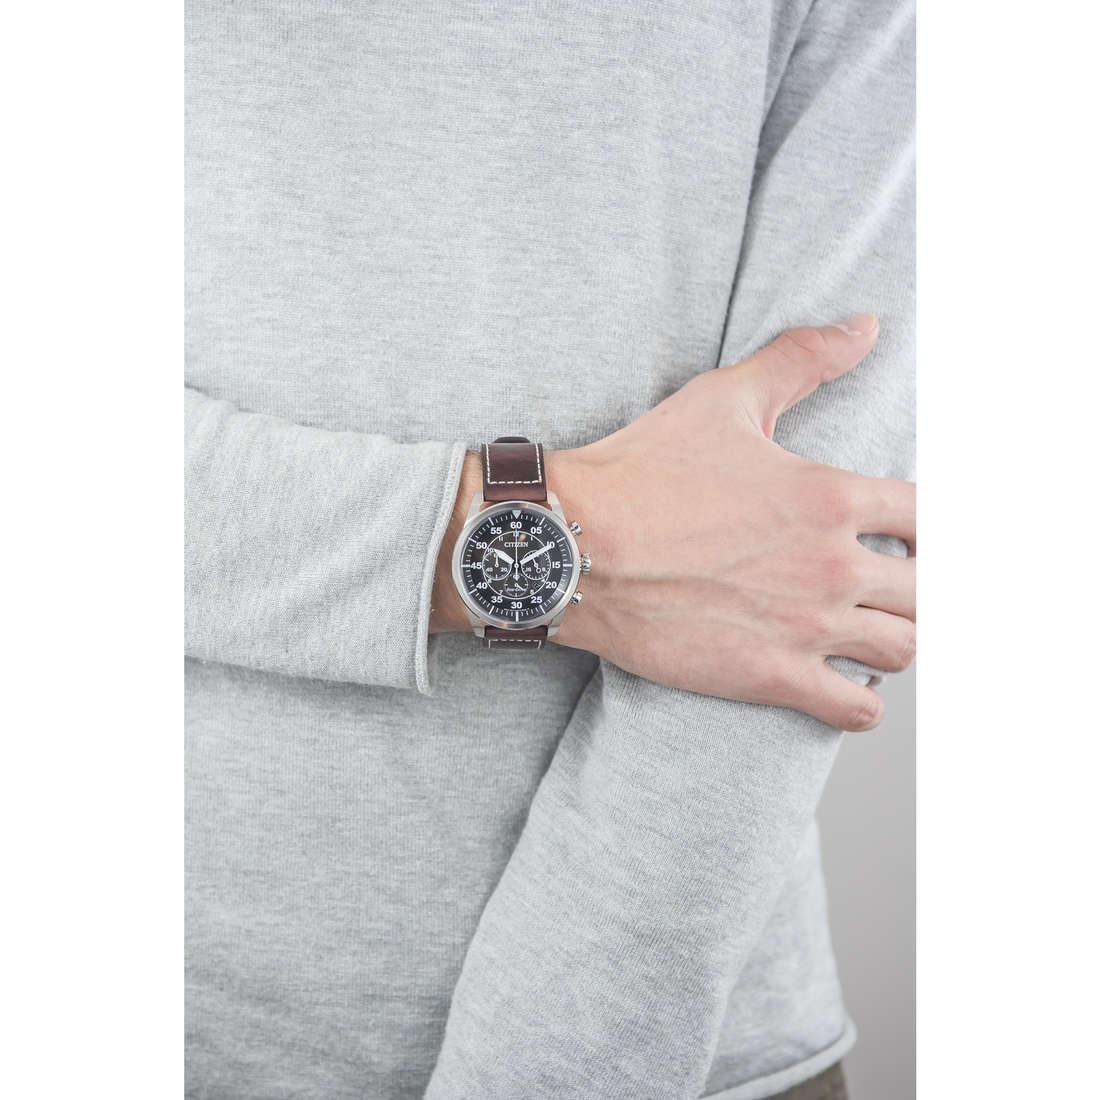 Citizen chronographes Eco-Drive homme CA4210-16E indosso